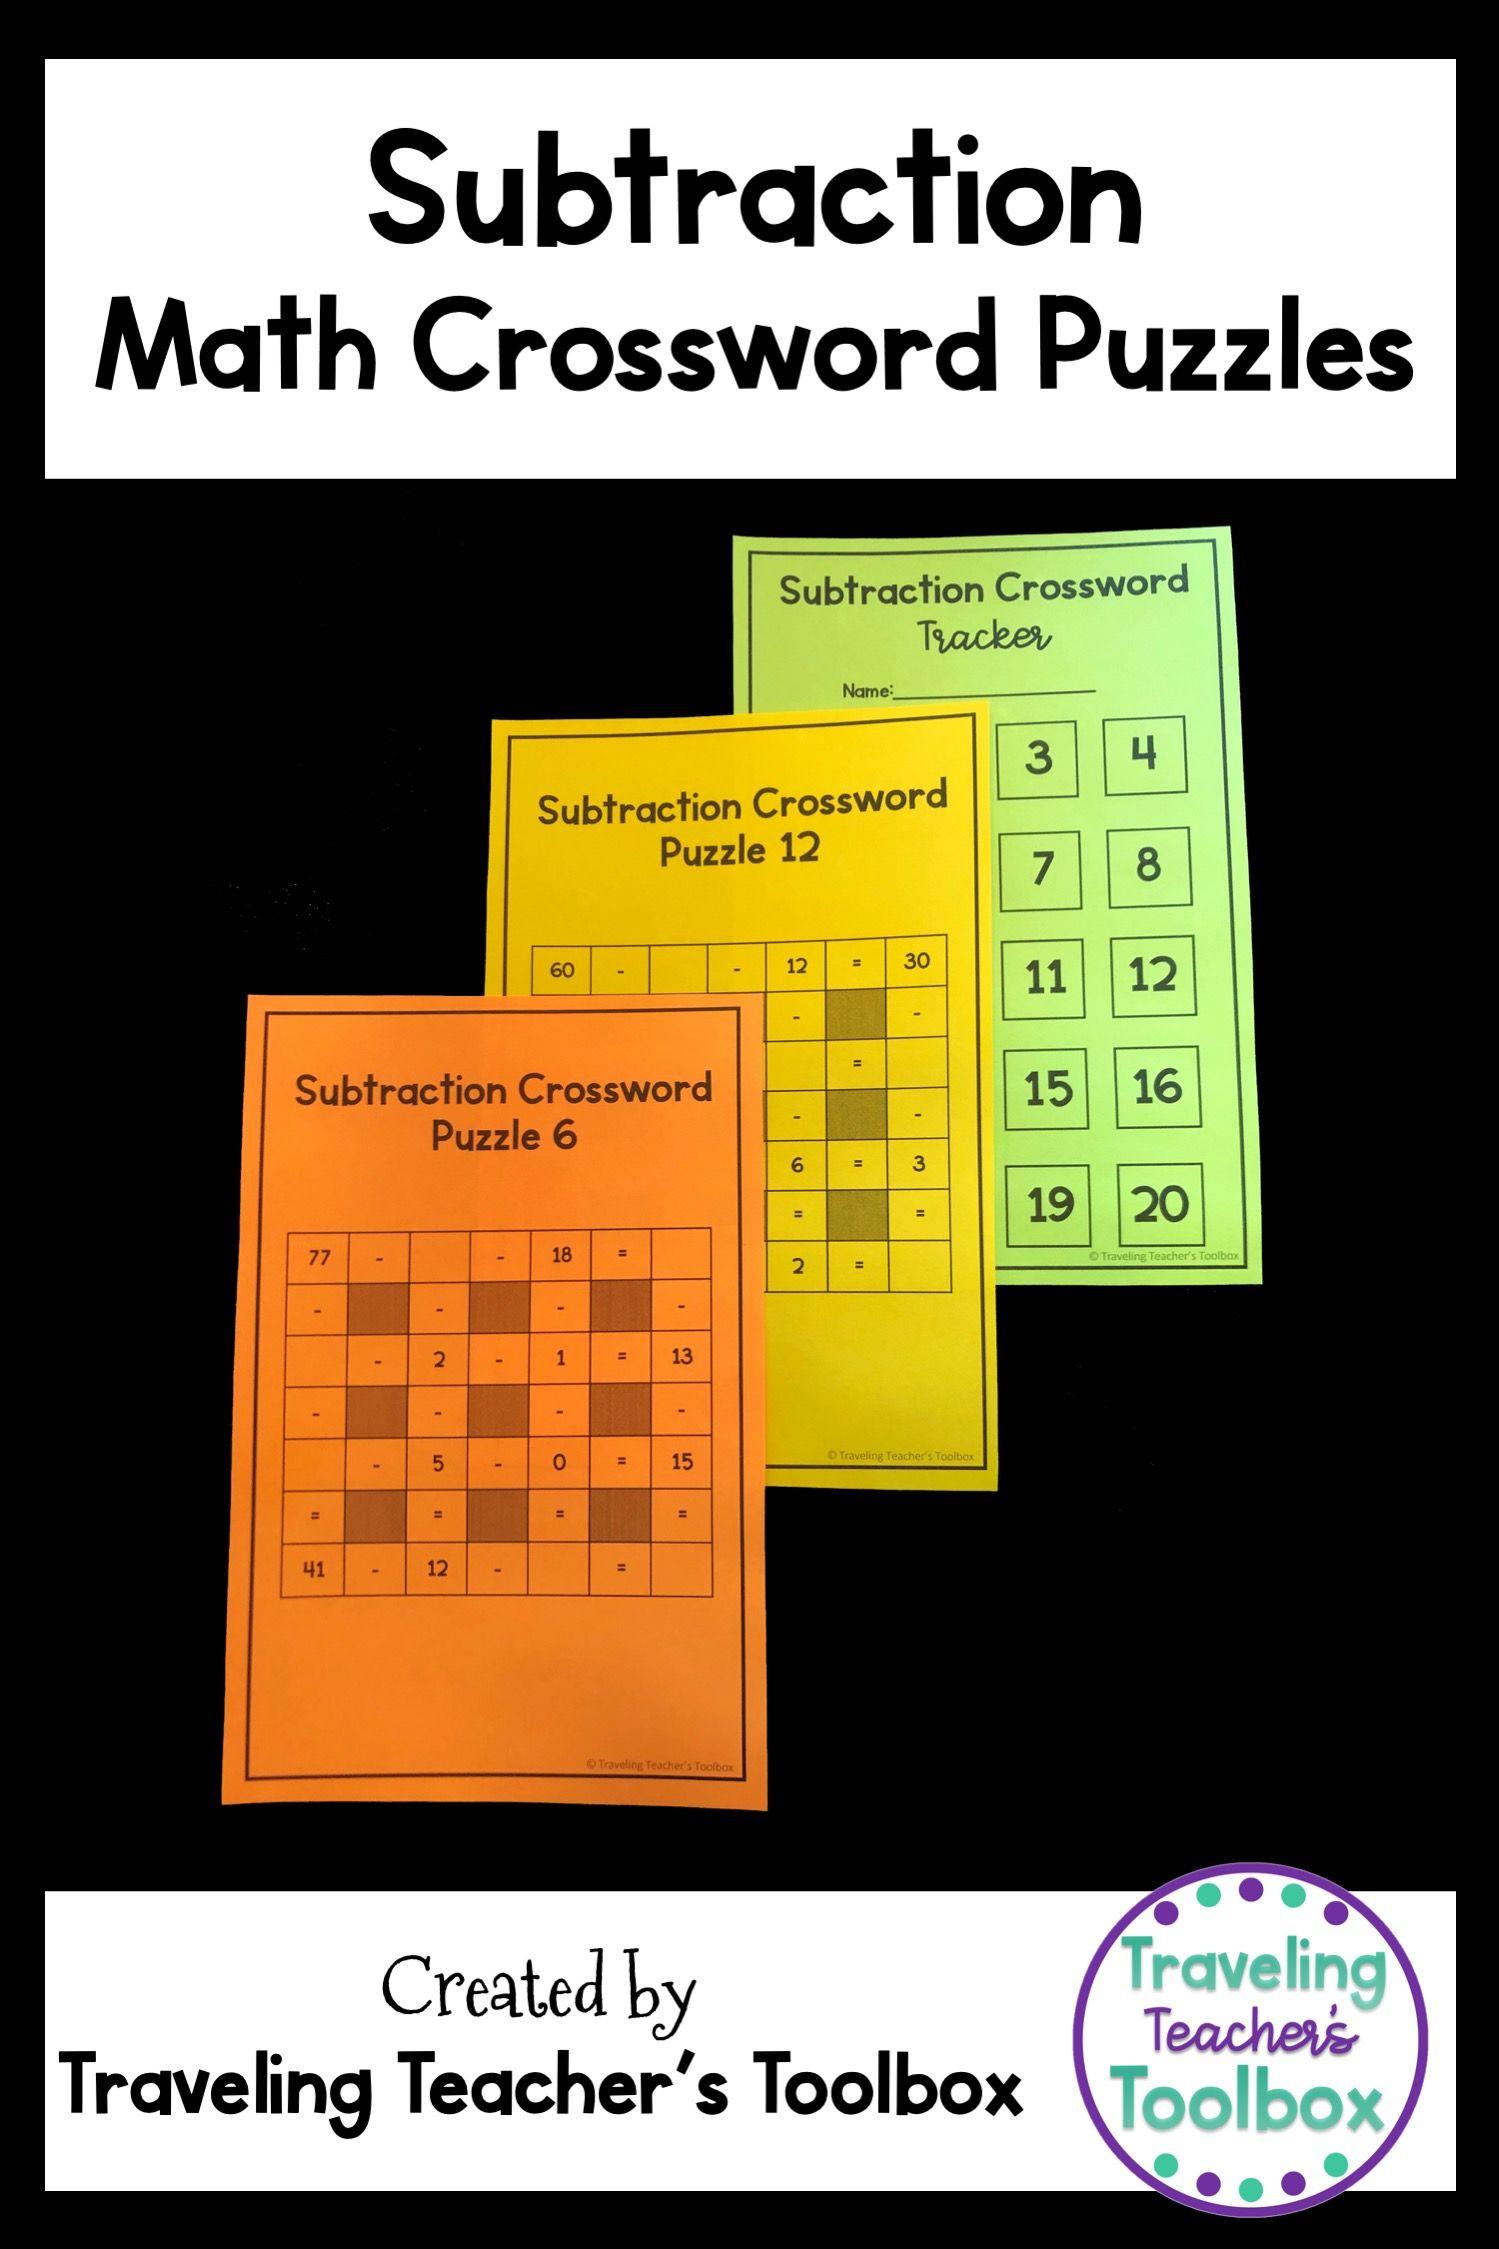 Subtraction Math Crossword Puzzles